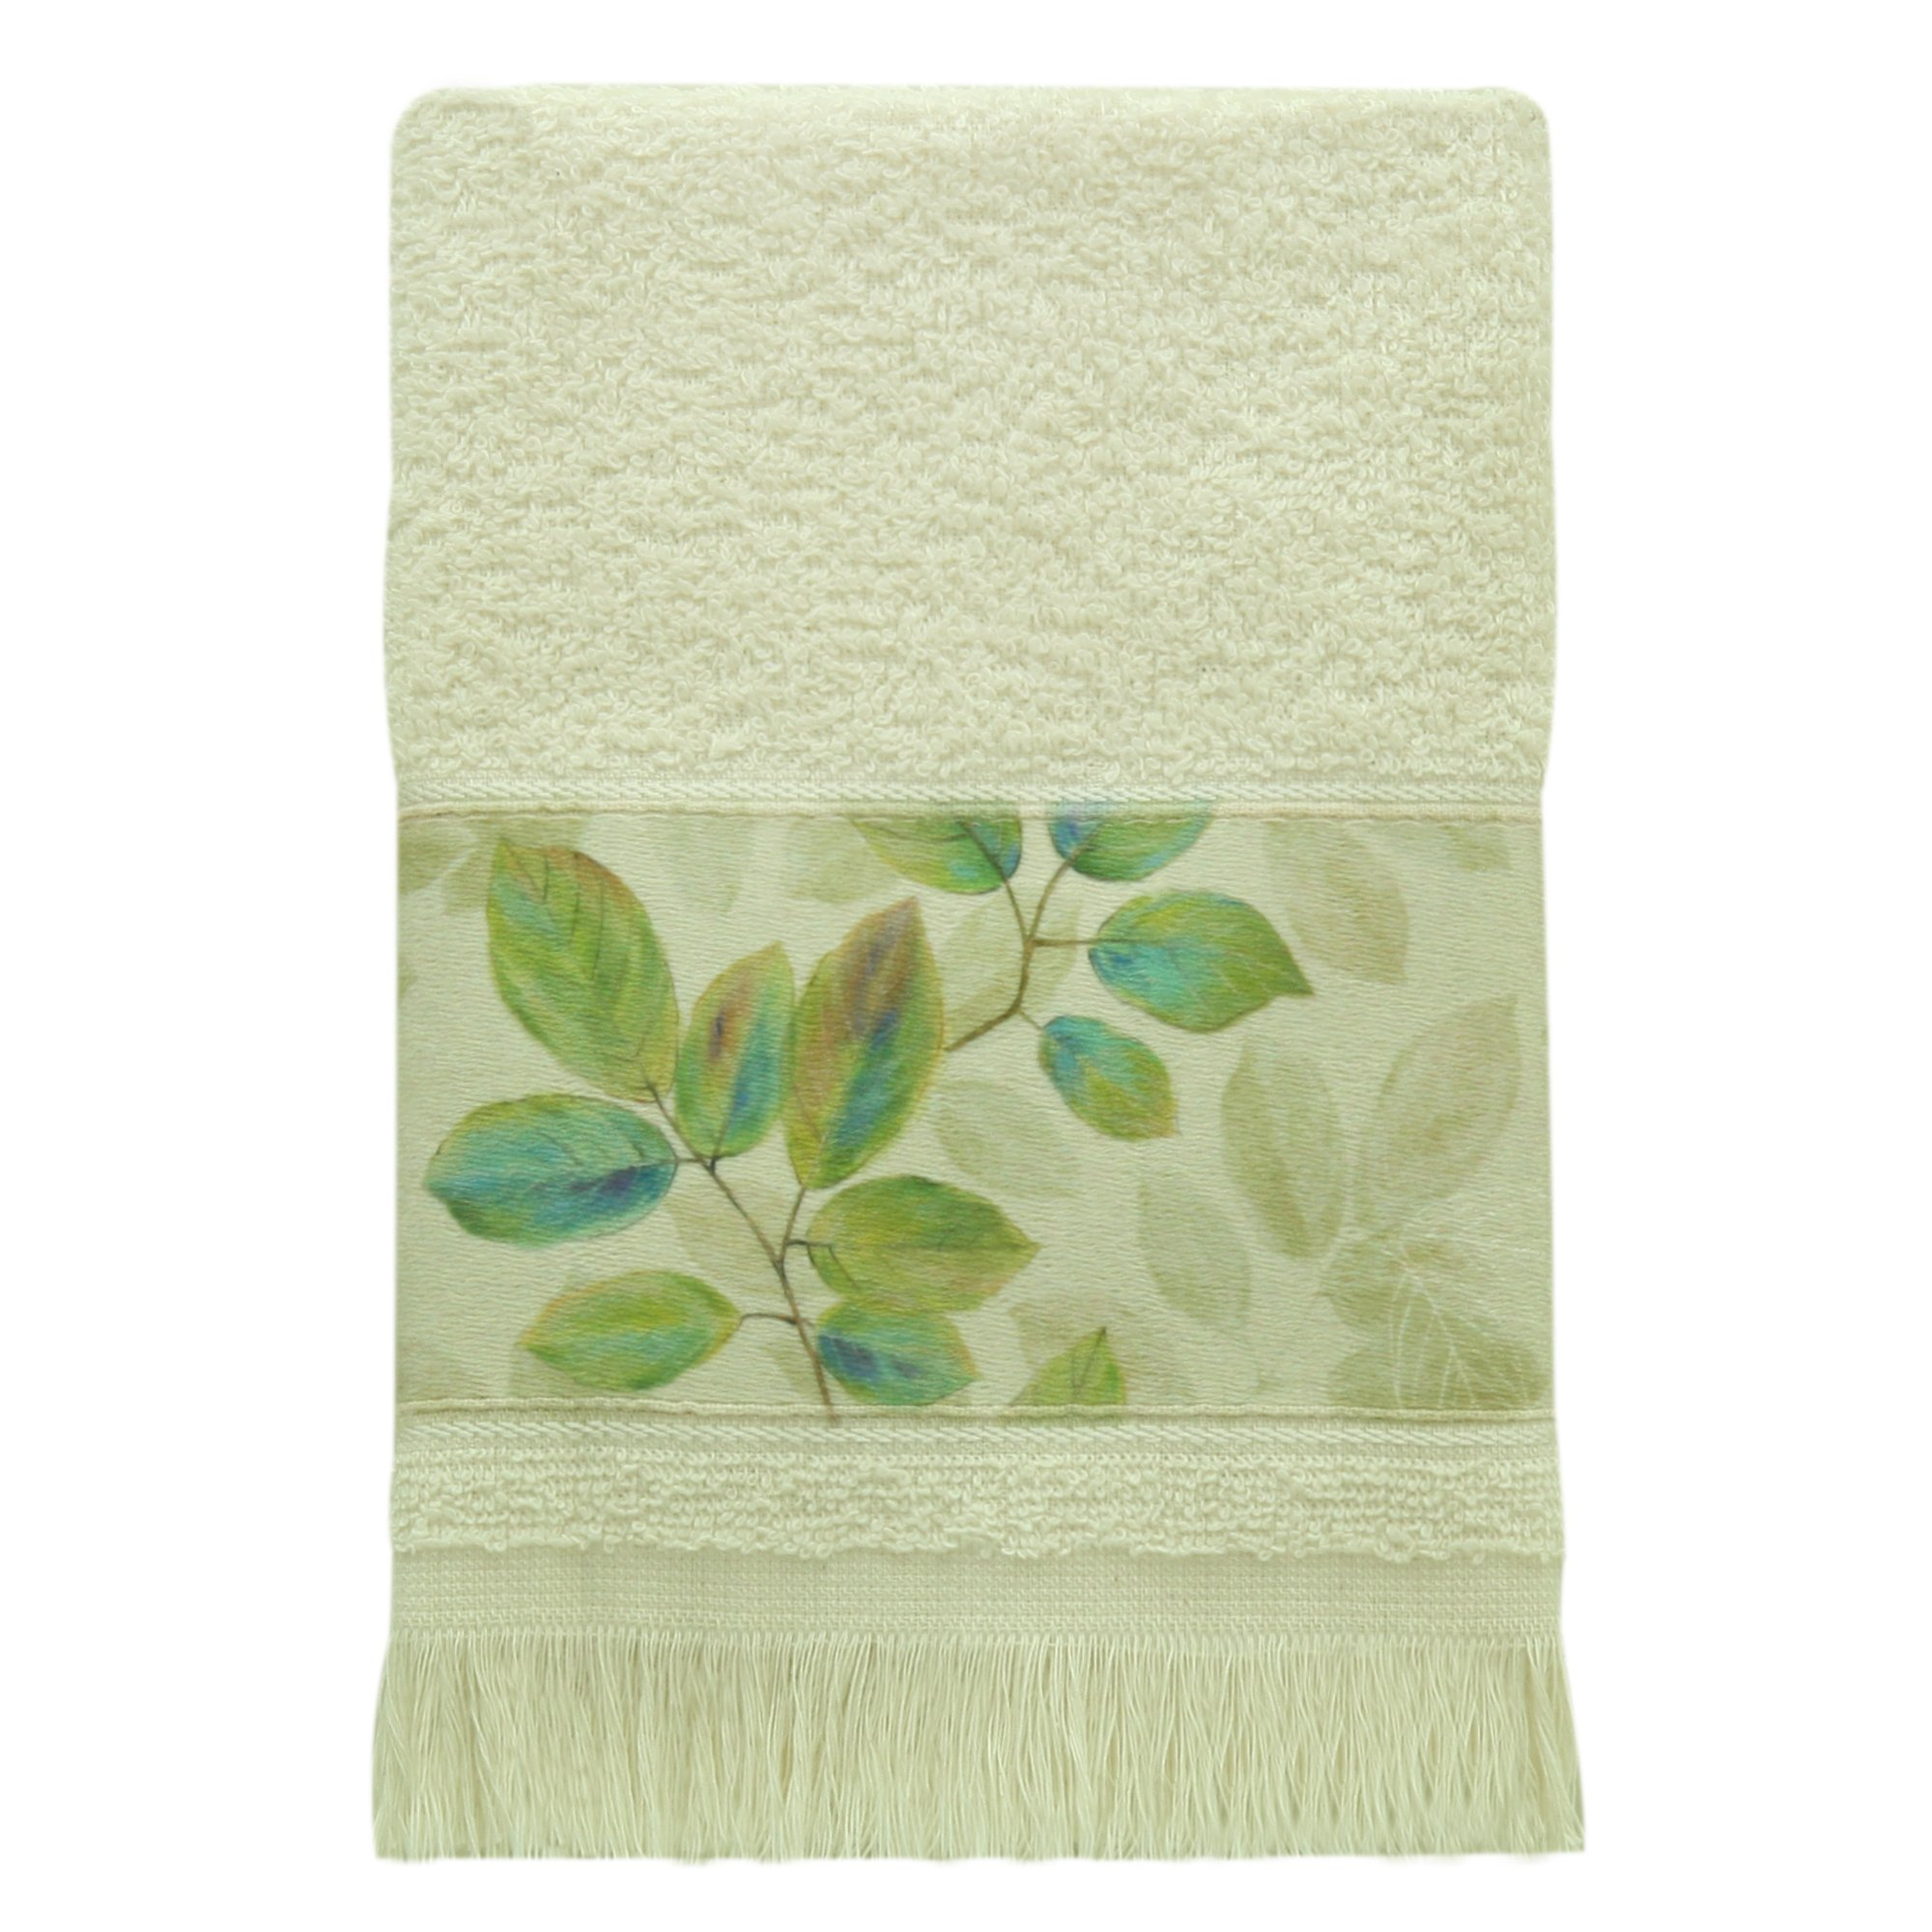 Bacova Guild Fingertip Towel, Waterfalls Leaves